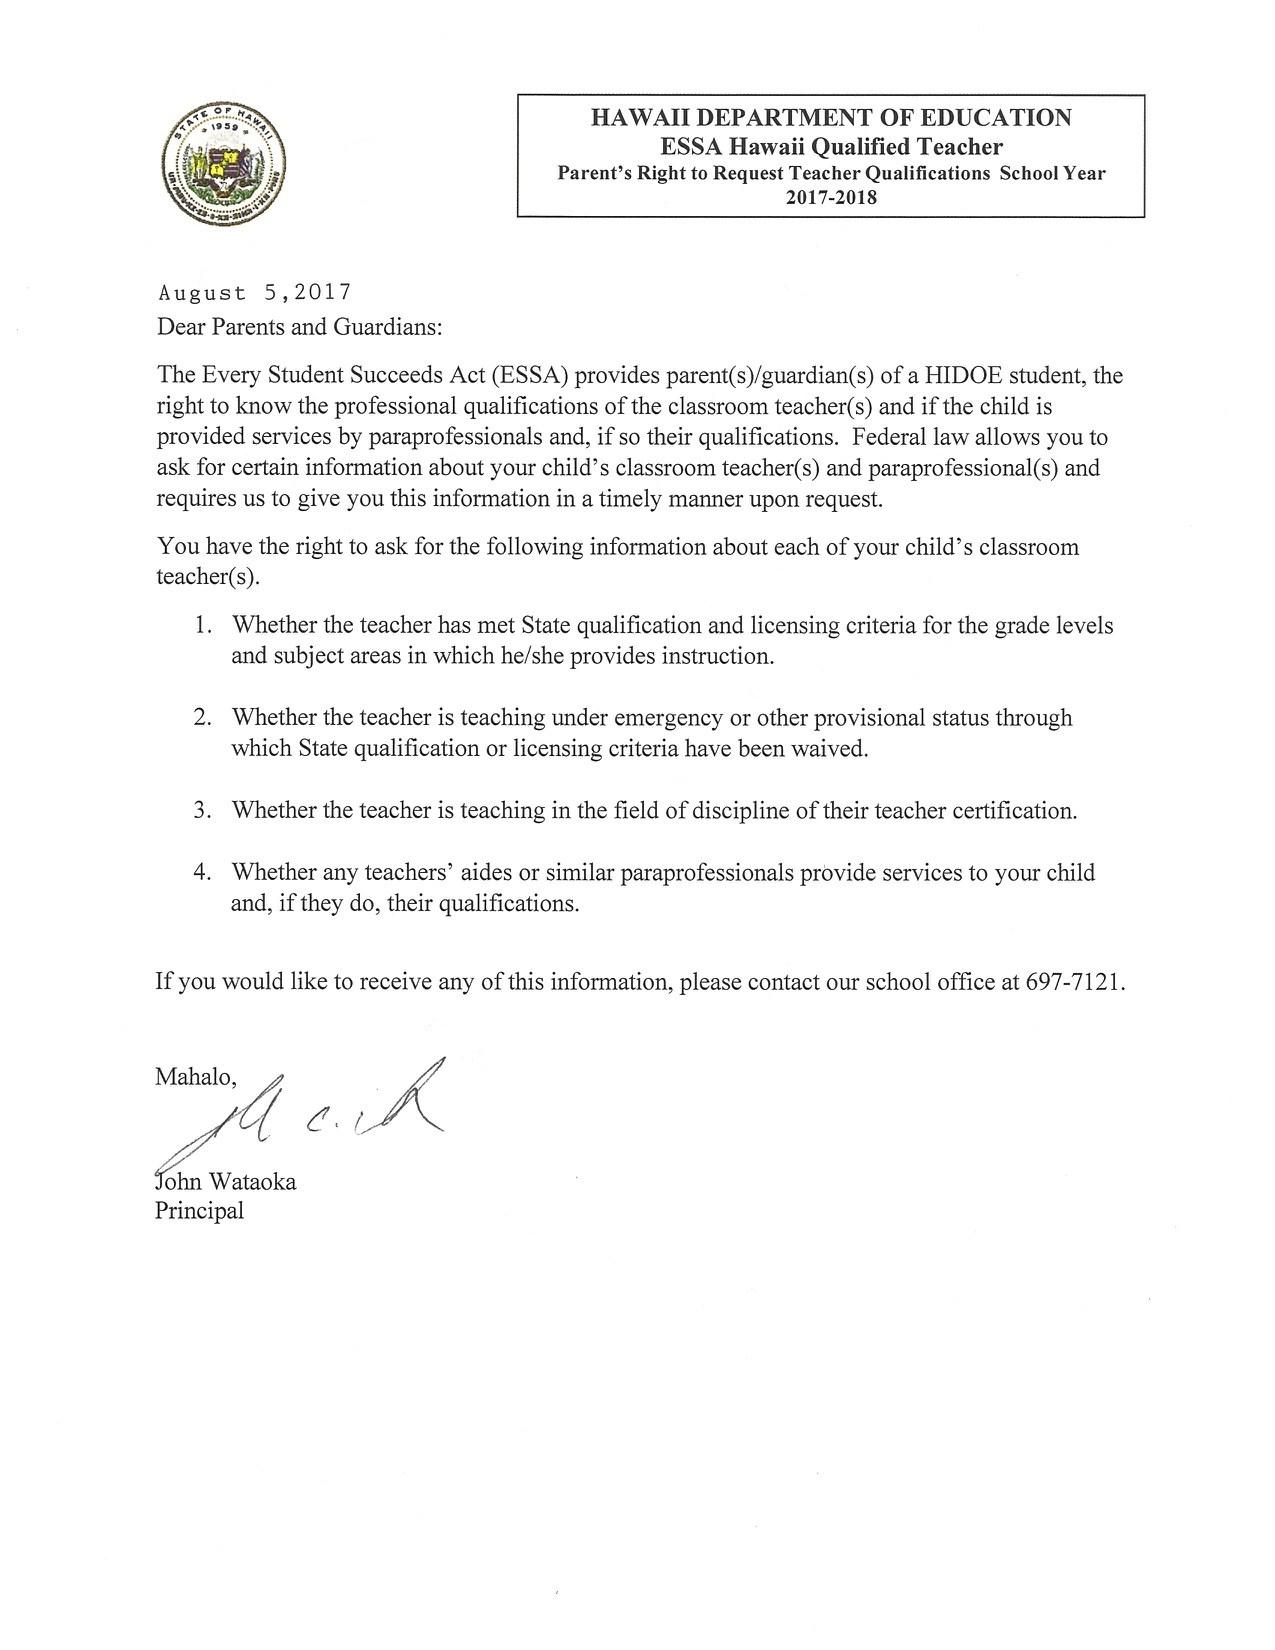 Essa ParentS Right To Request Teacher Qualifications For School